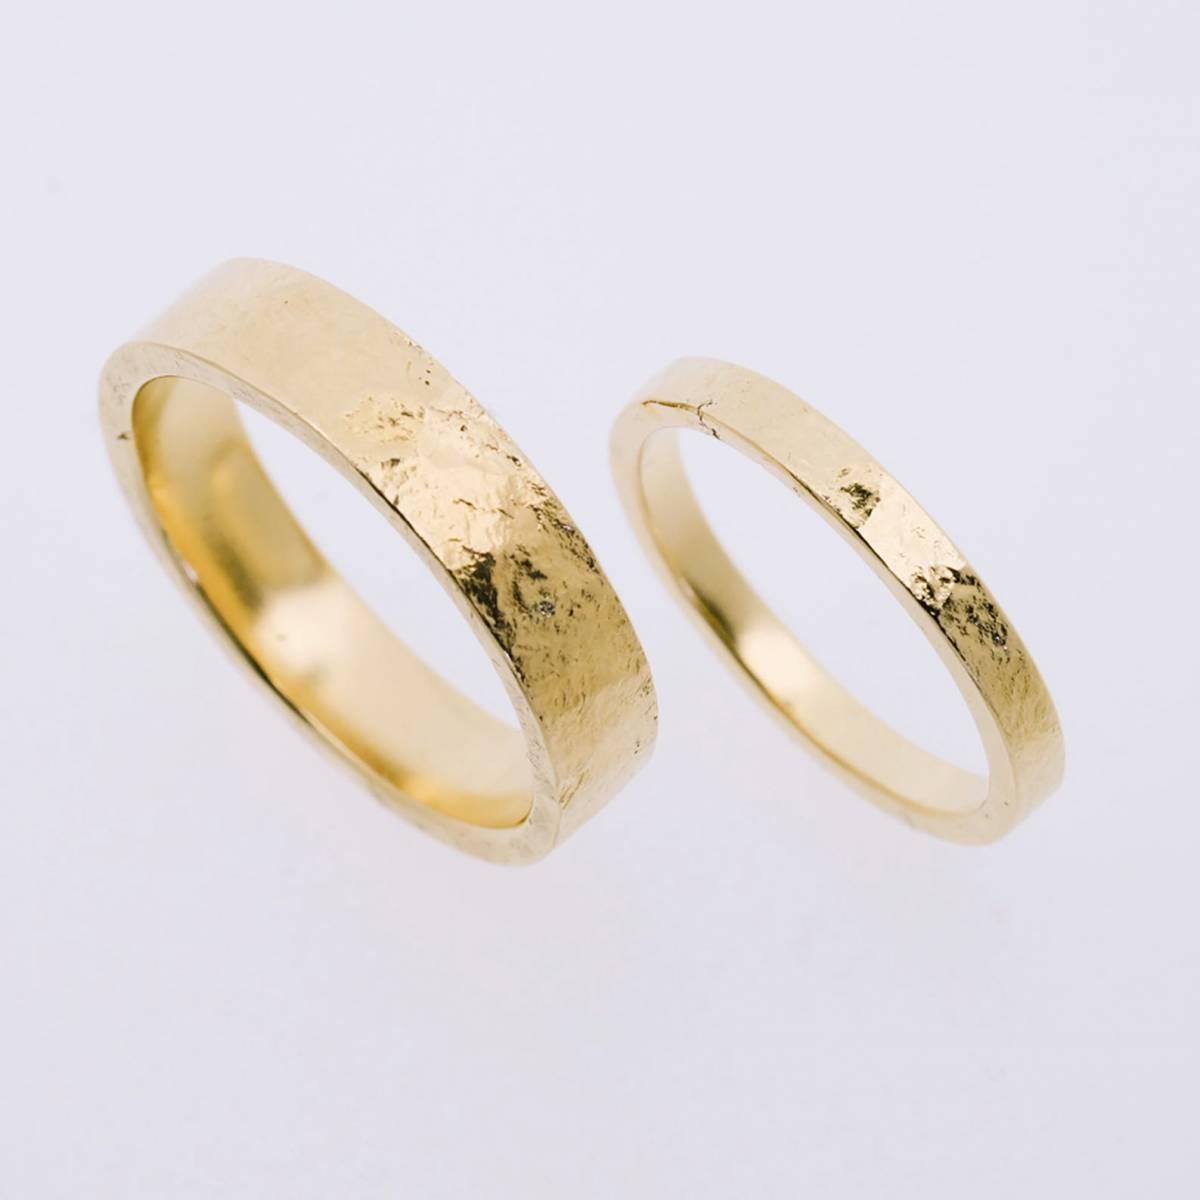 Jonas Maes Jewels - Juwelen - Bruidsjuwelen - Verlovingsring - Trouwring - House of Weddings - 10